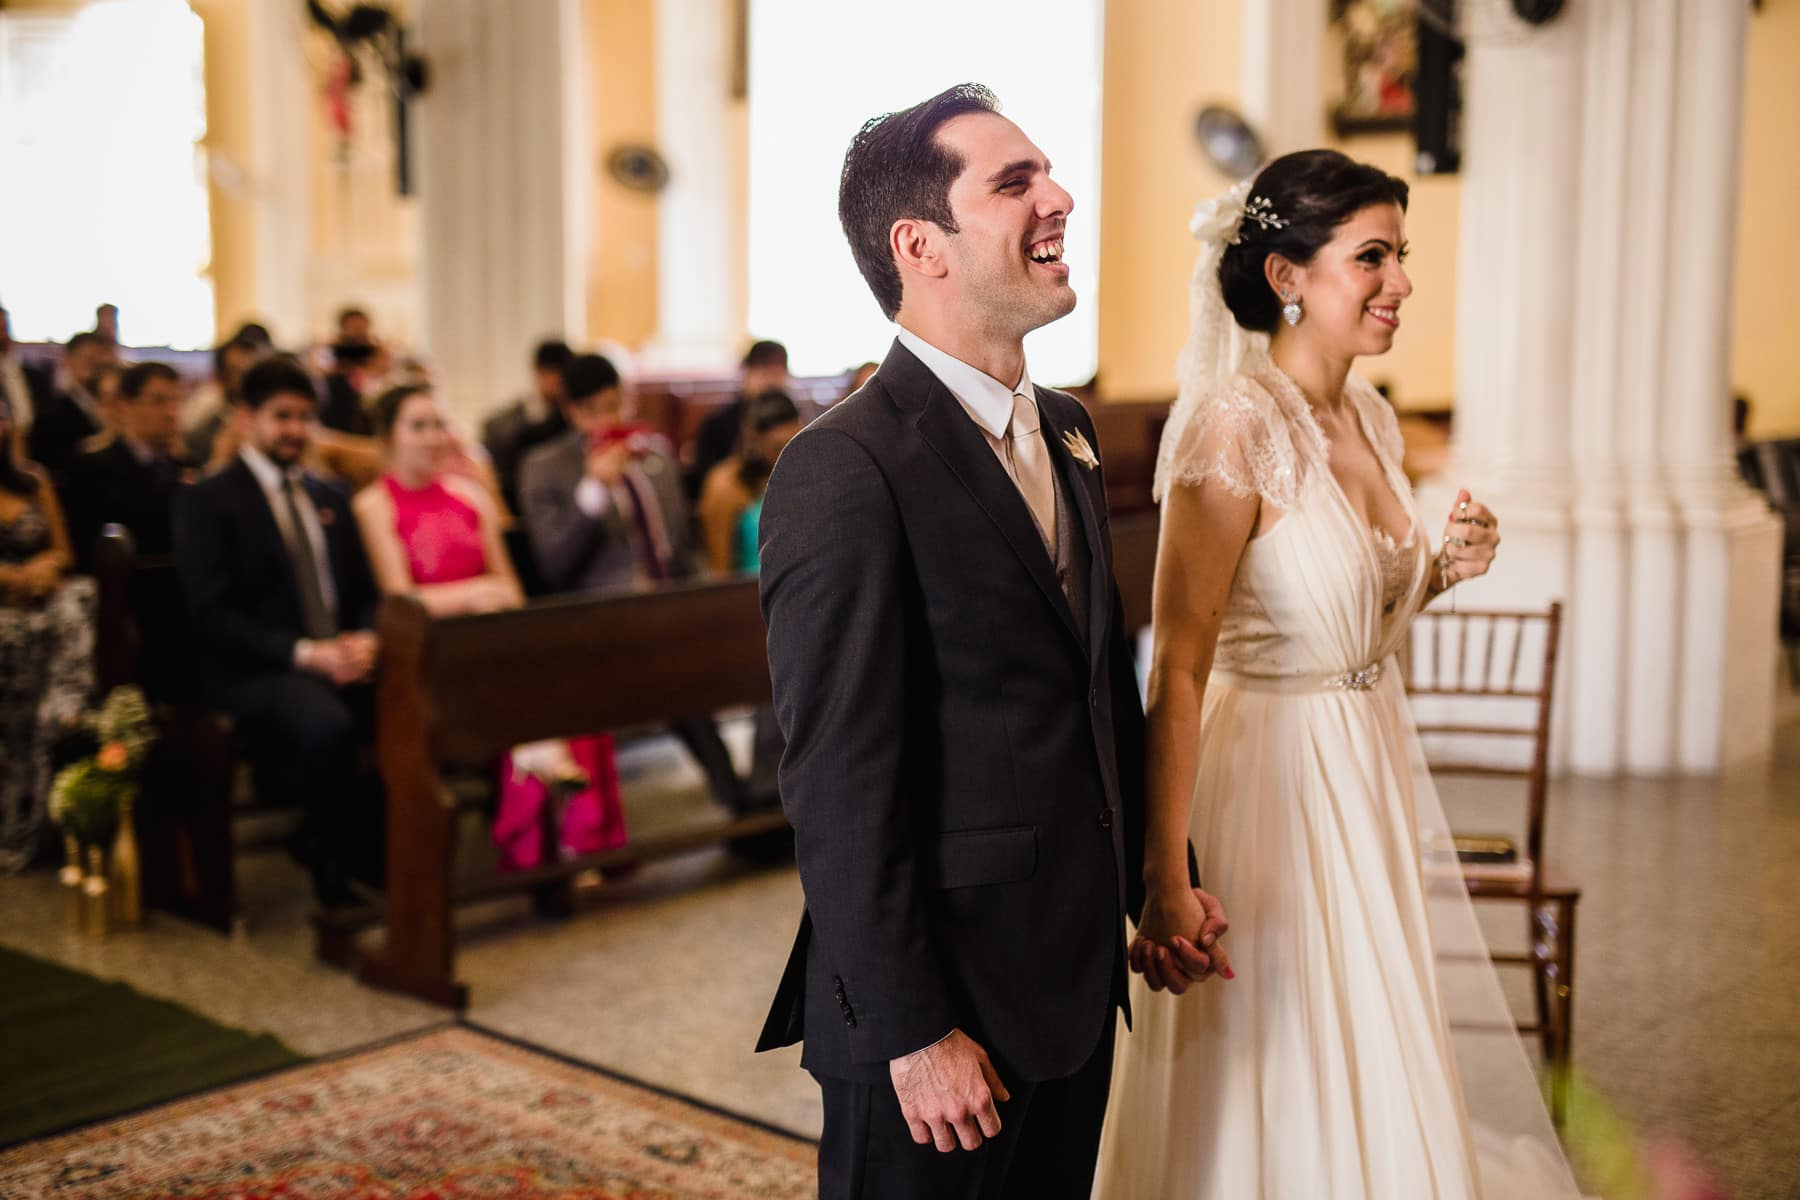 casamento-igreja-do-cristo-rei-fortaleza-32